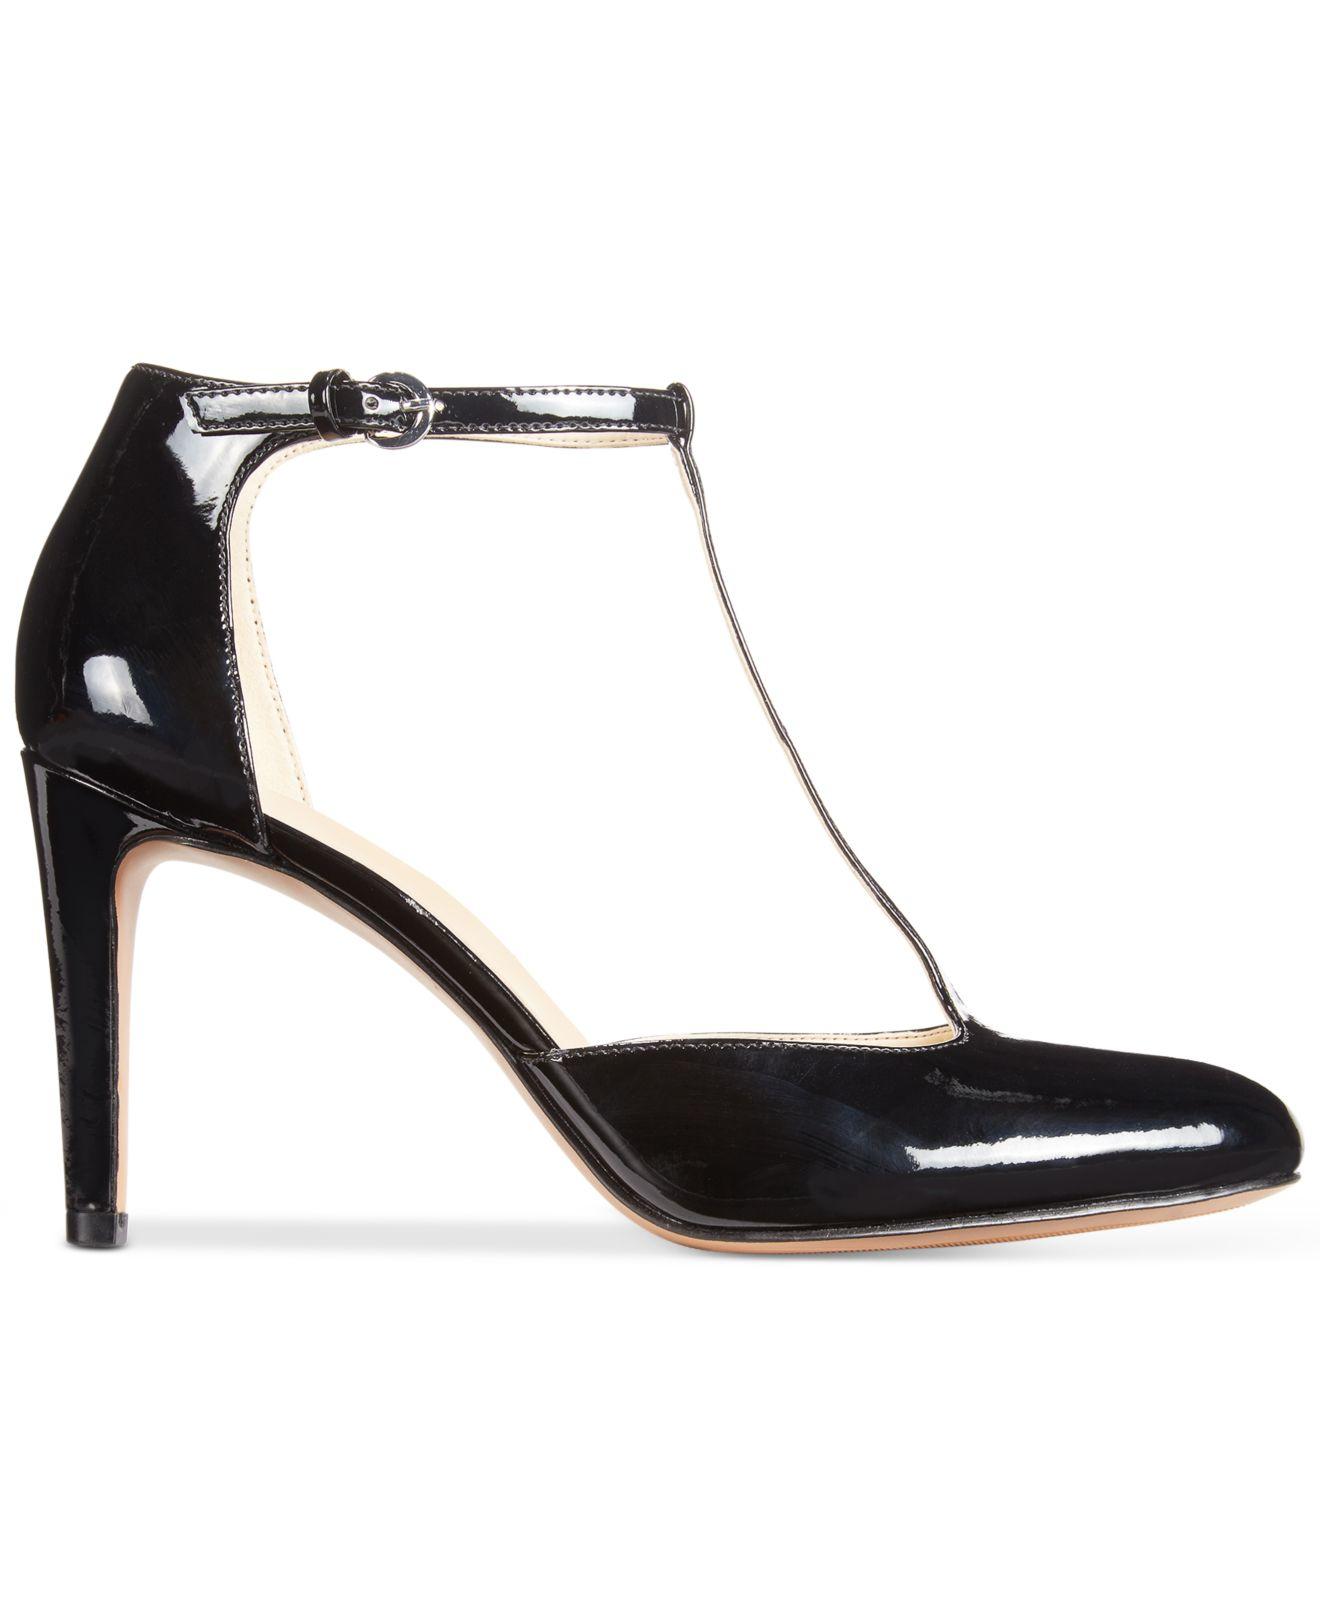 Shoes Macy S Black Closed Toe